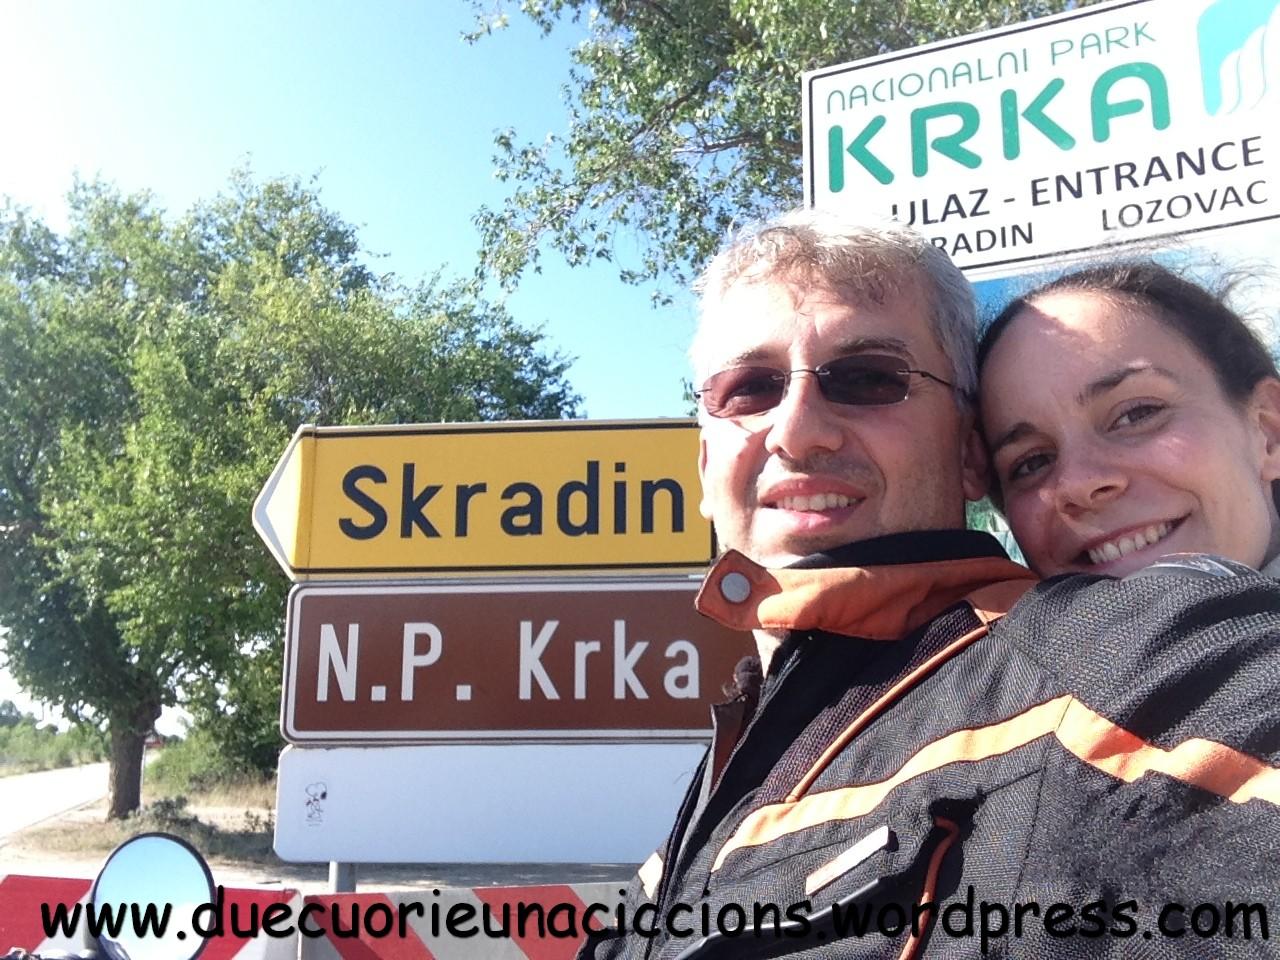 I Due cuori arrivano a Krka